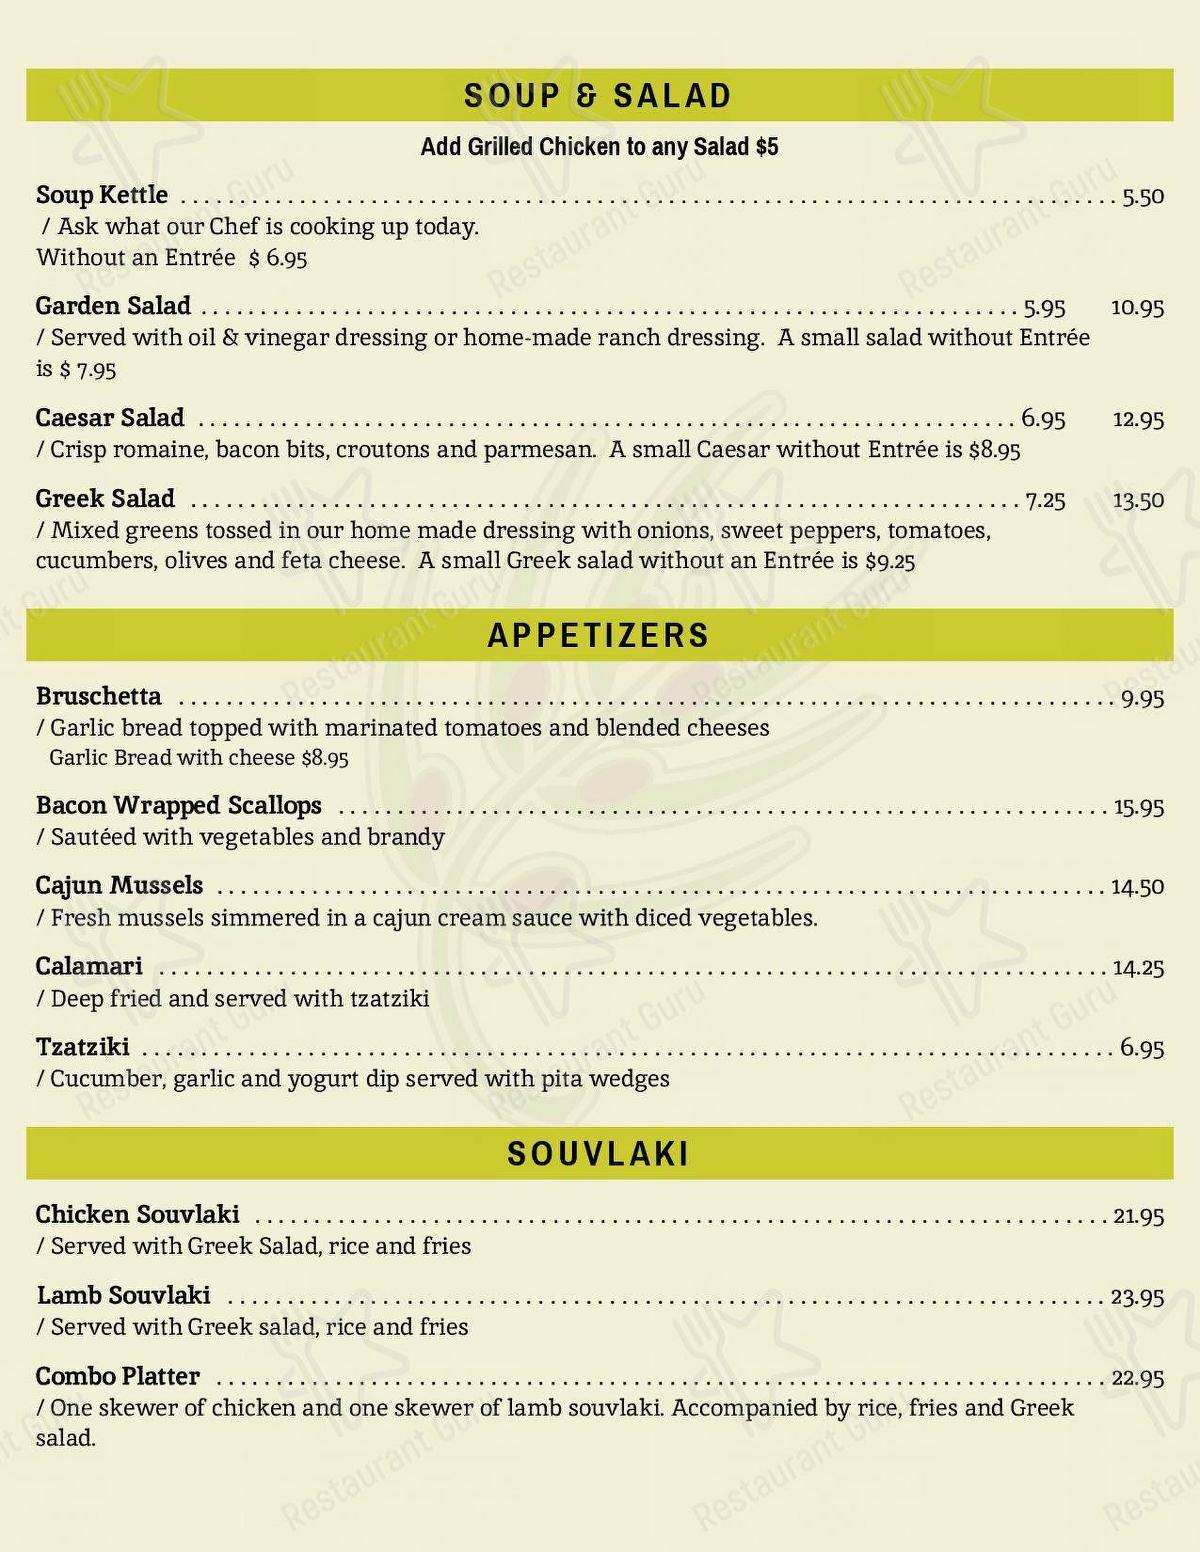 ROMERO'S RESTAURANT menu - dishes and beverages